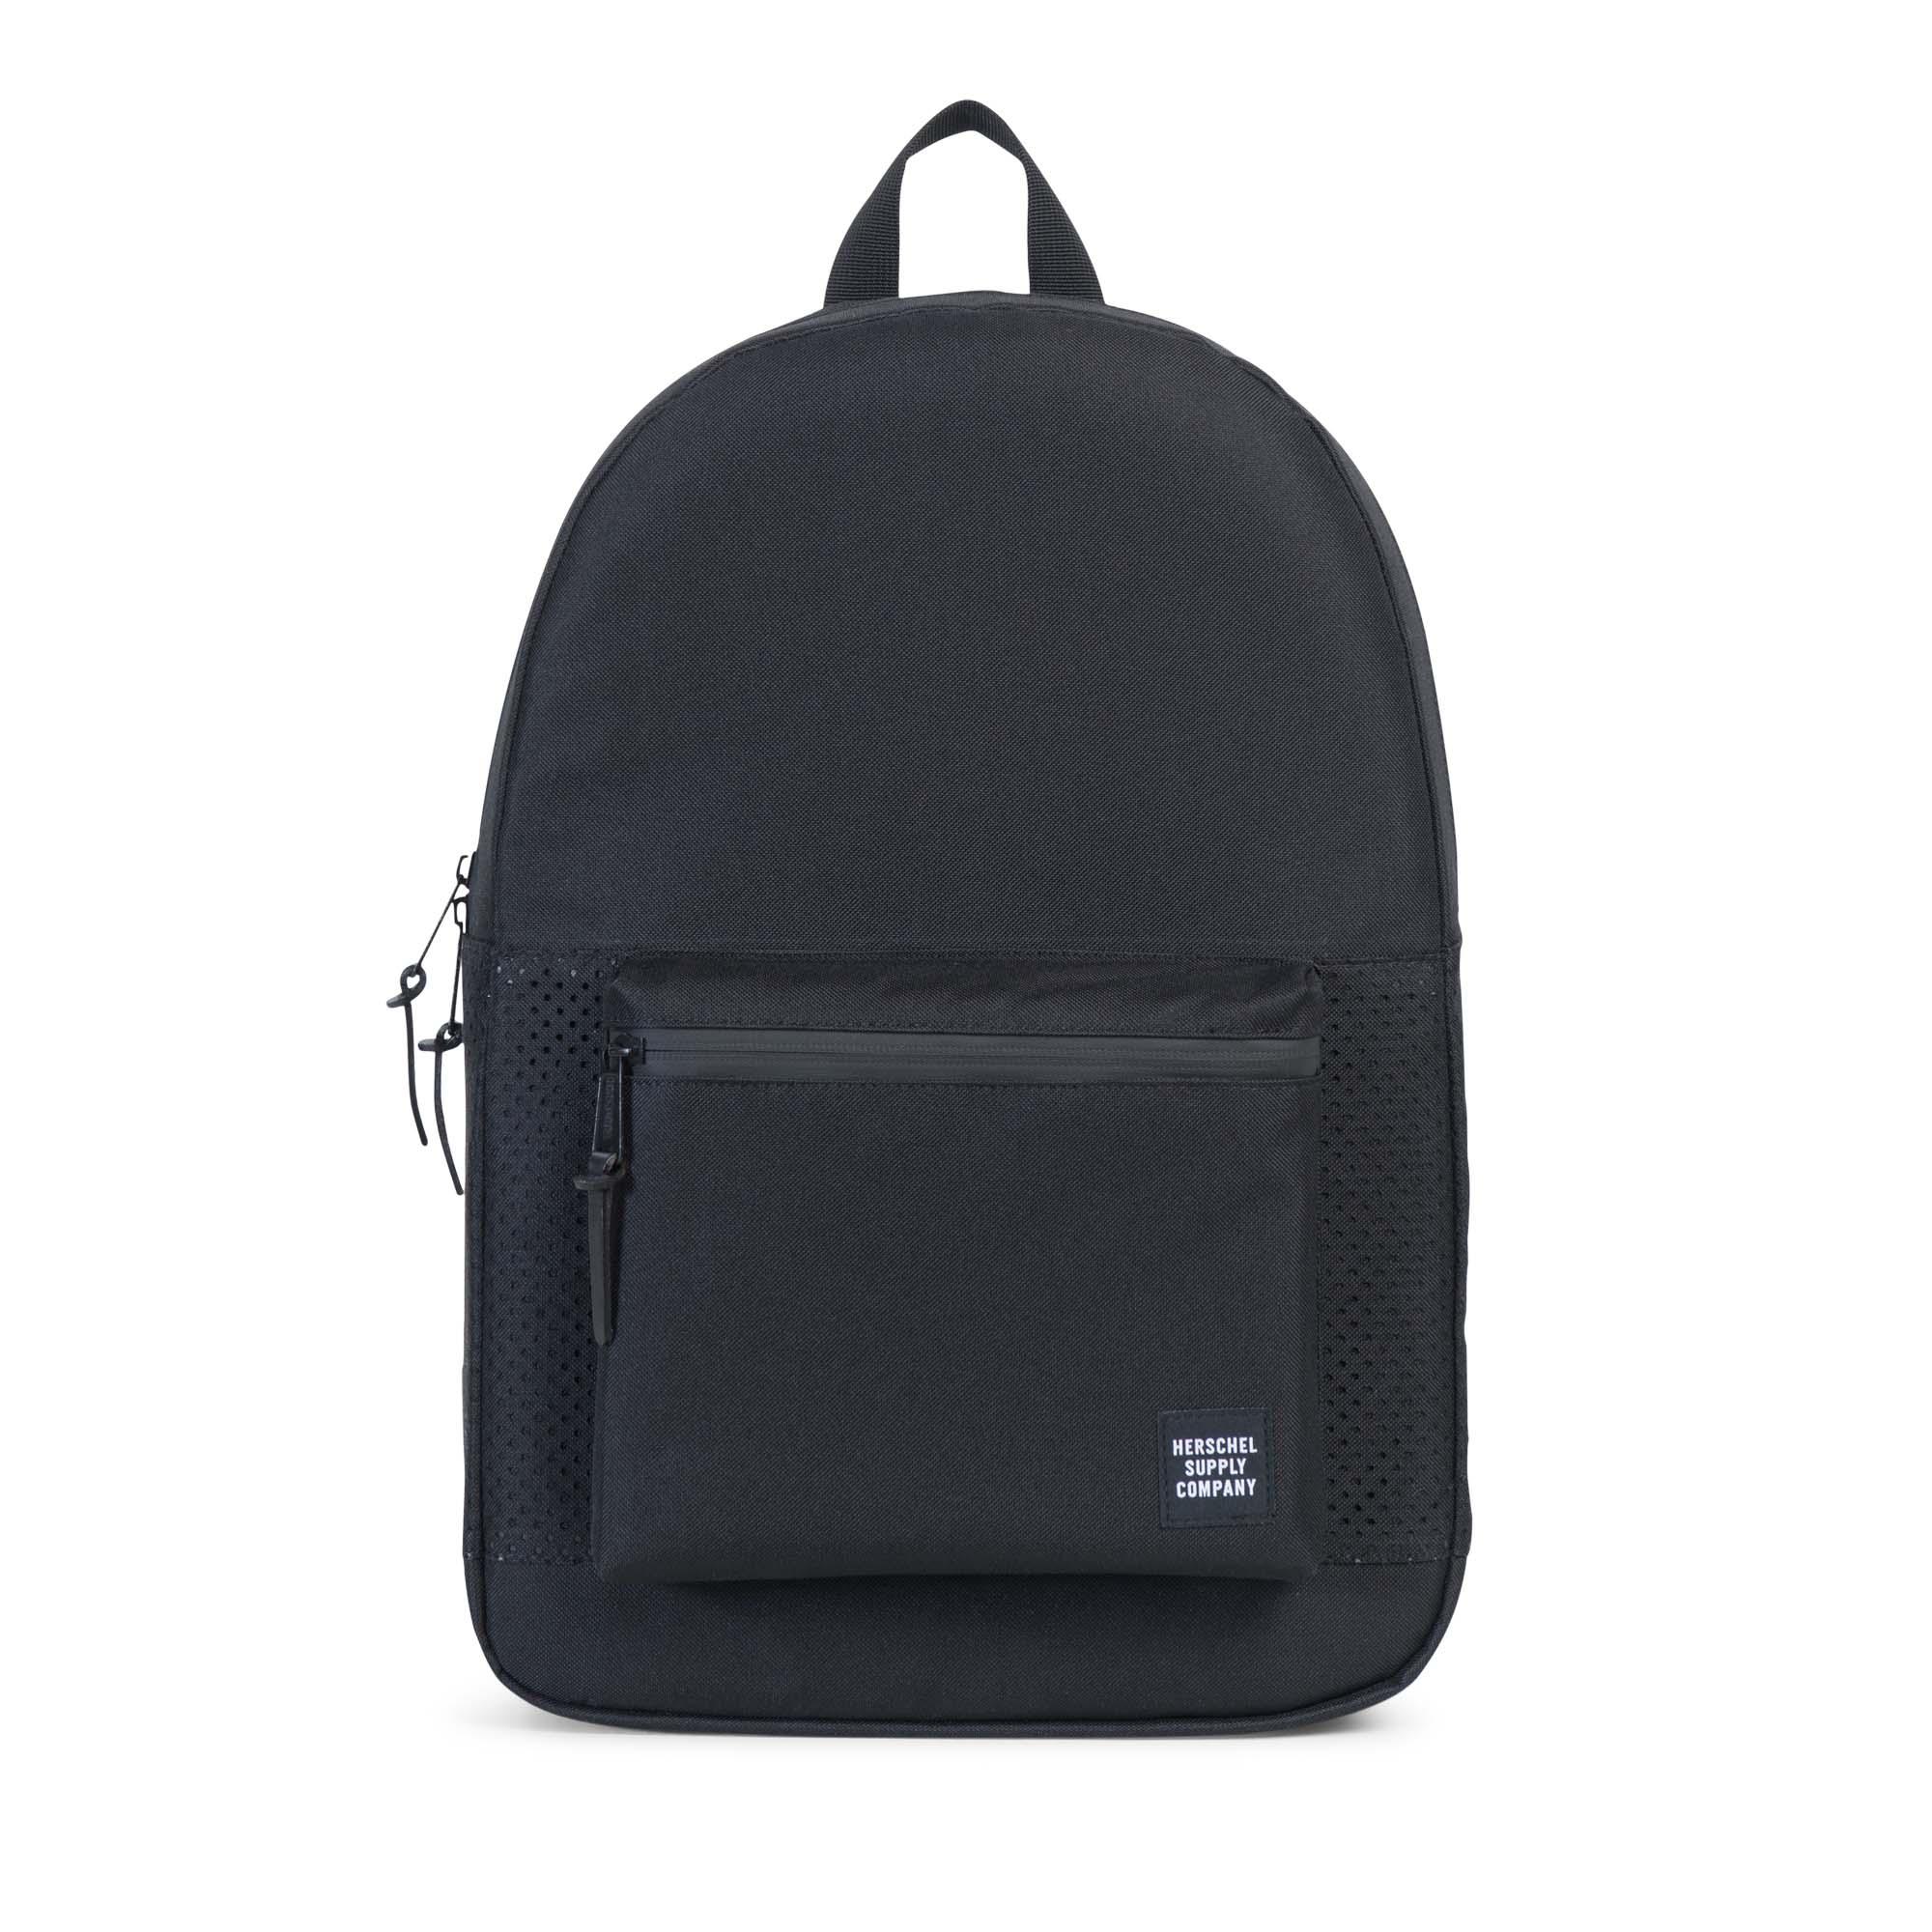 professional sale sale good service Settlement Backpack | Herschel Supply Company